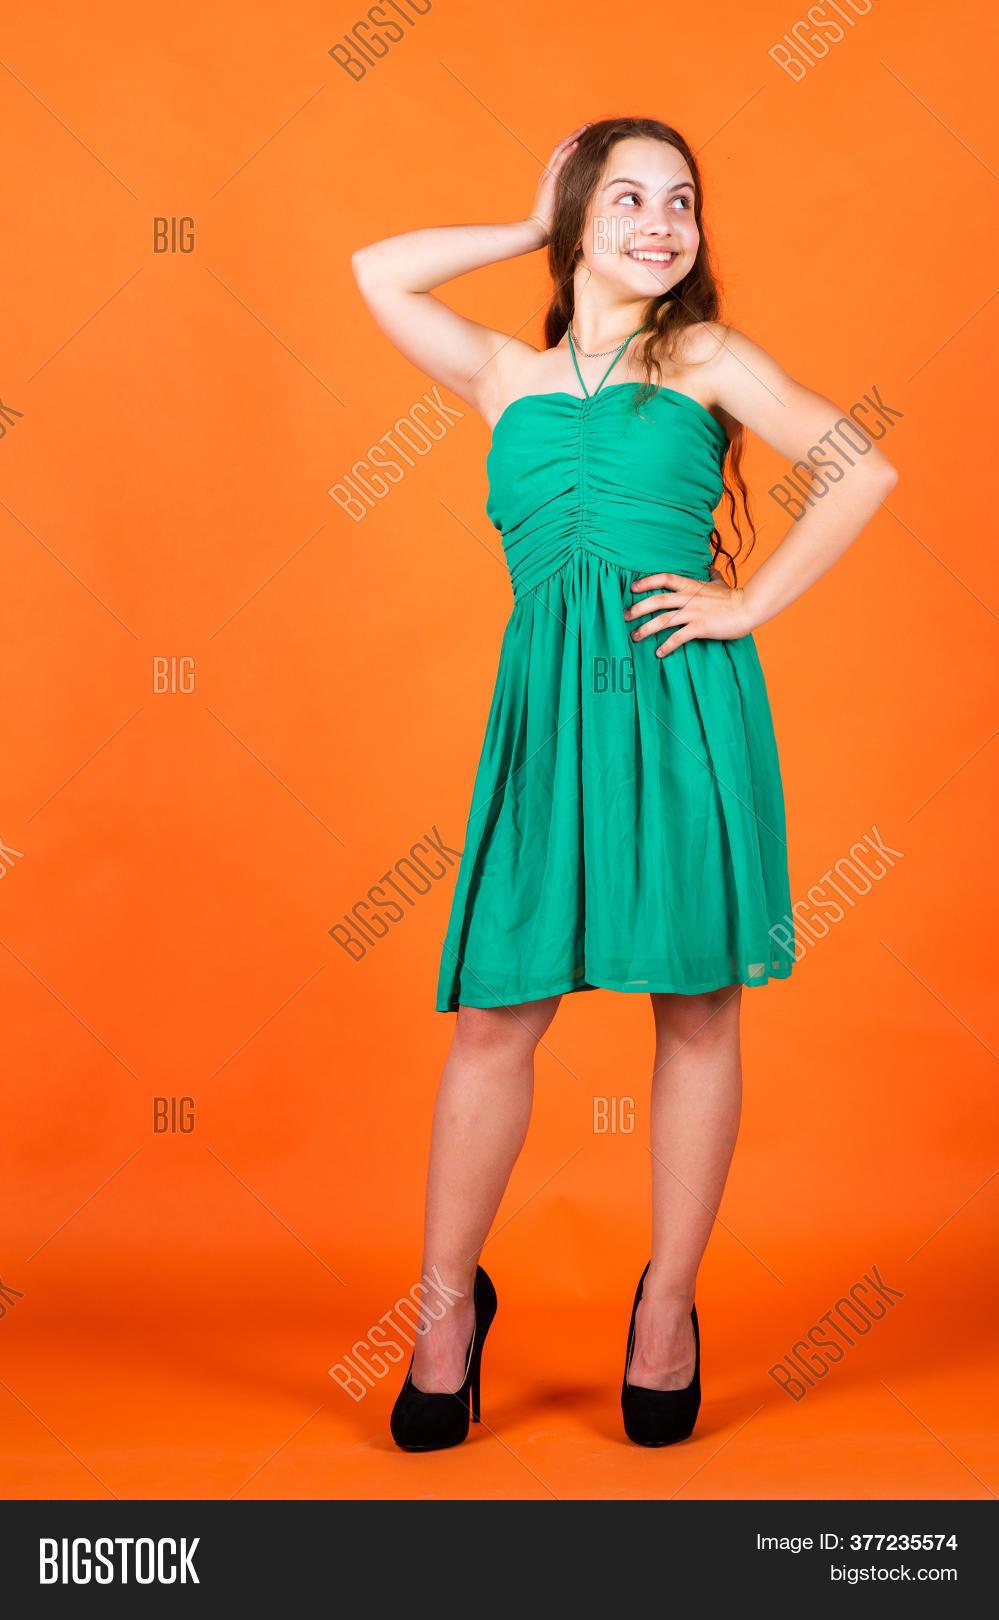 Glamour Fashion Model Image Photo Free Trial Bigstock